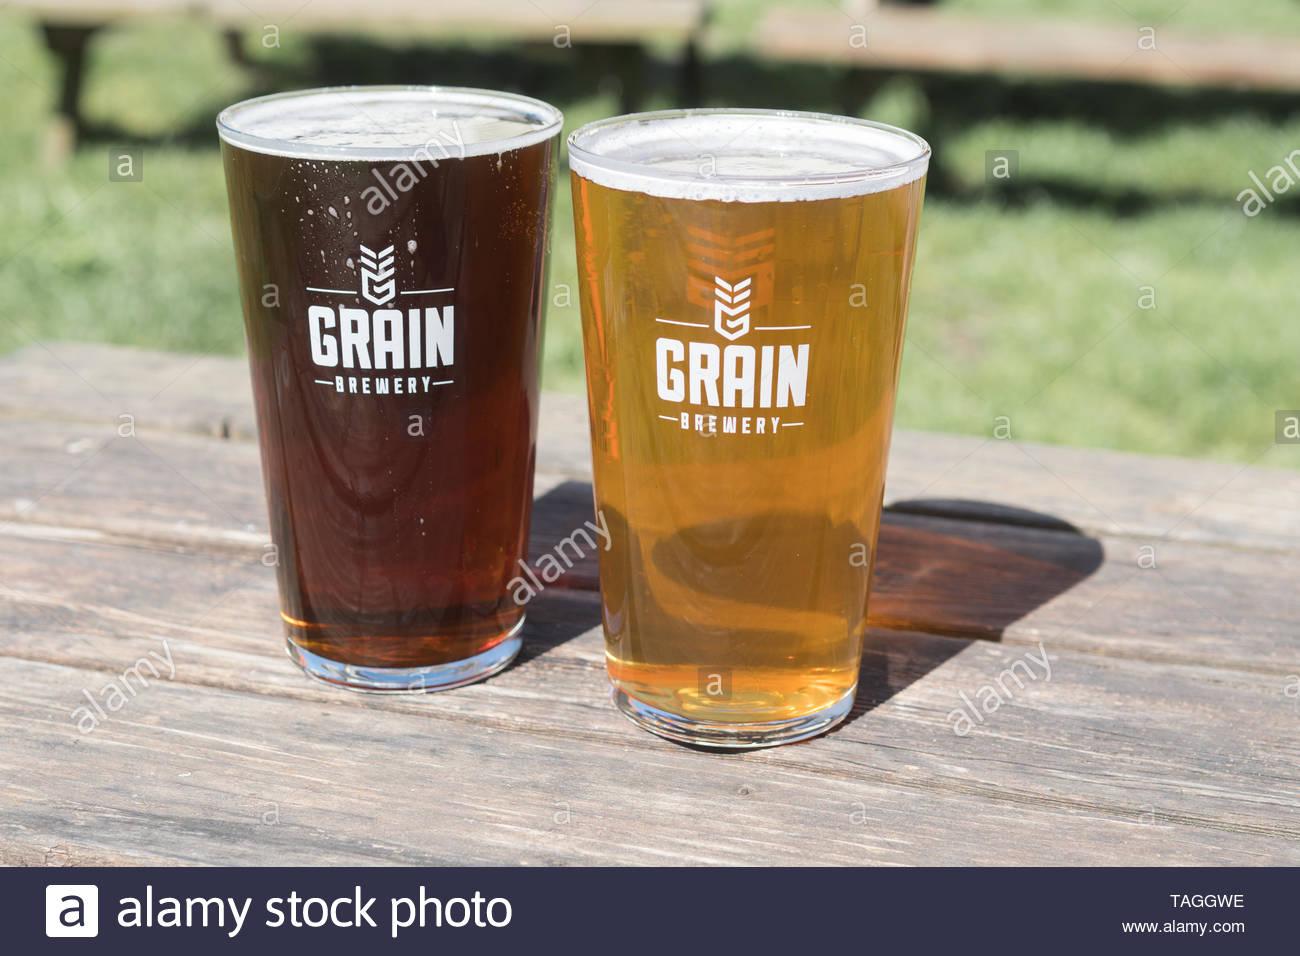 Grain Brewery beer in the beer garden at The Locks, Geldeston, Norfolk, England - a Grain Brewery public house - Stock Image